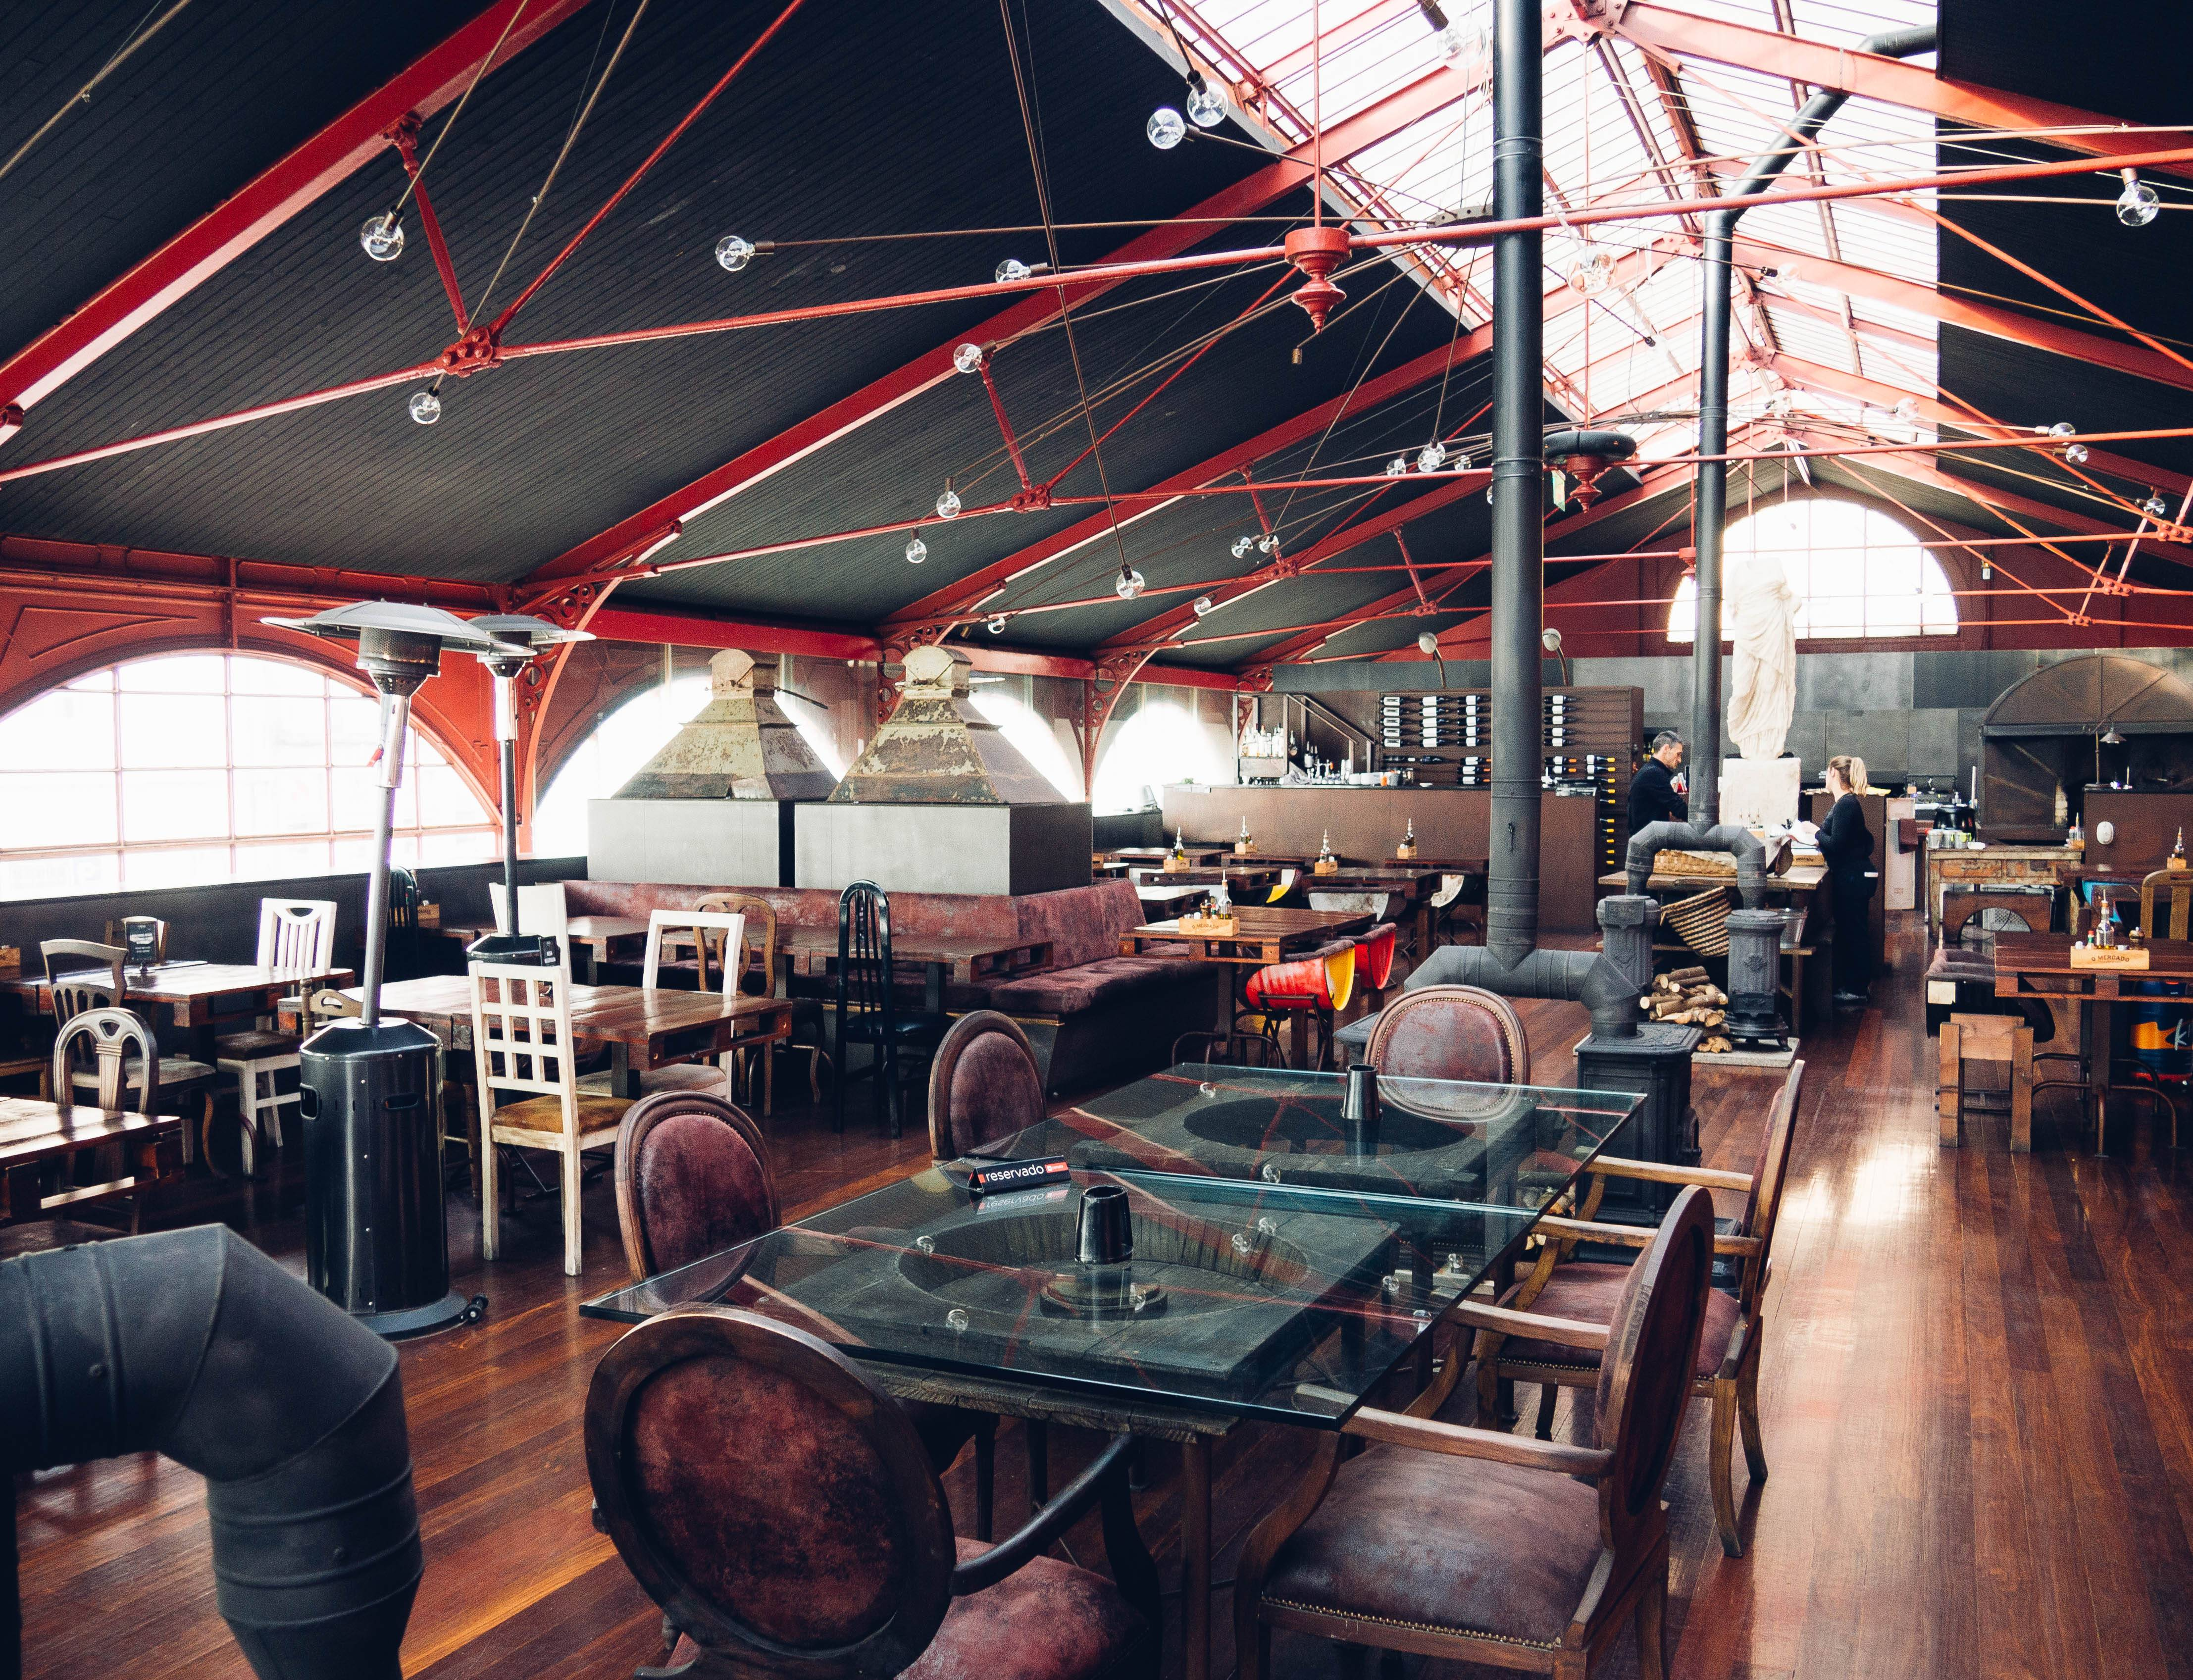 Photo 1: O Mercado, le restaurant industriel